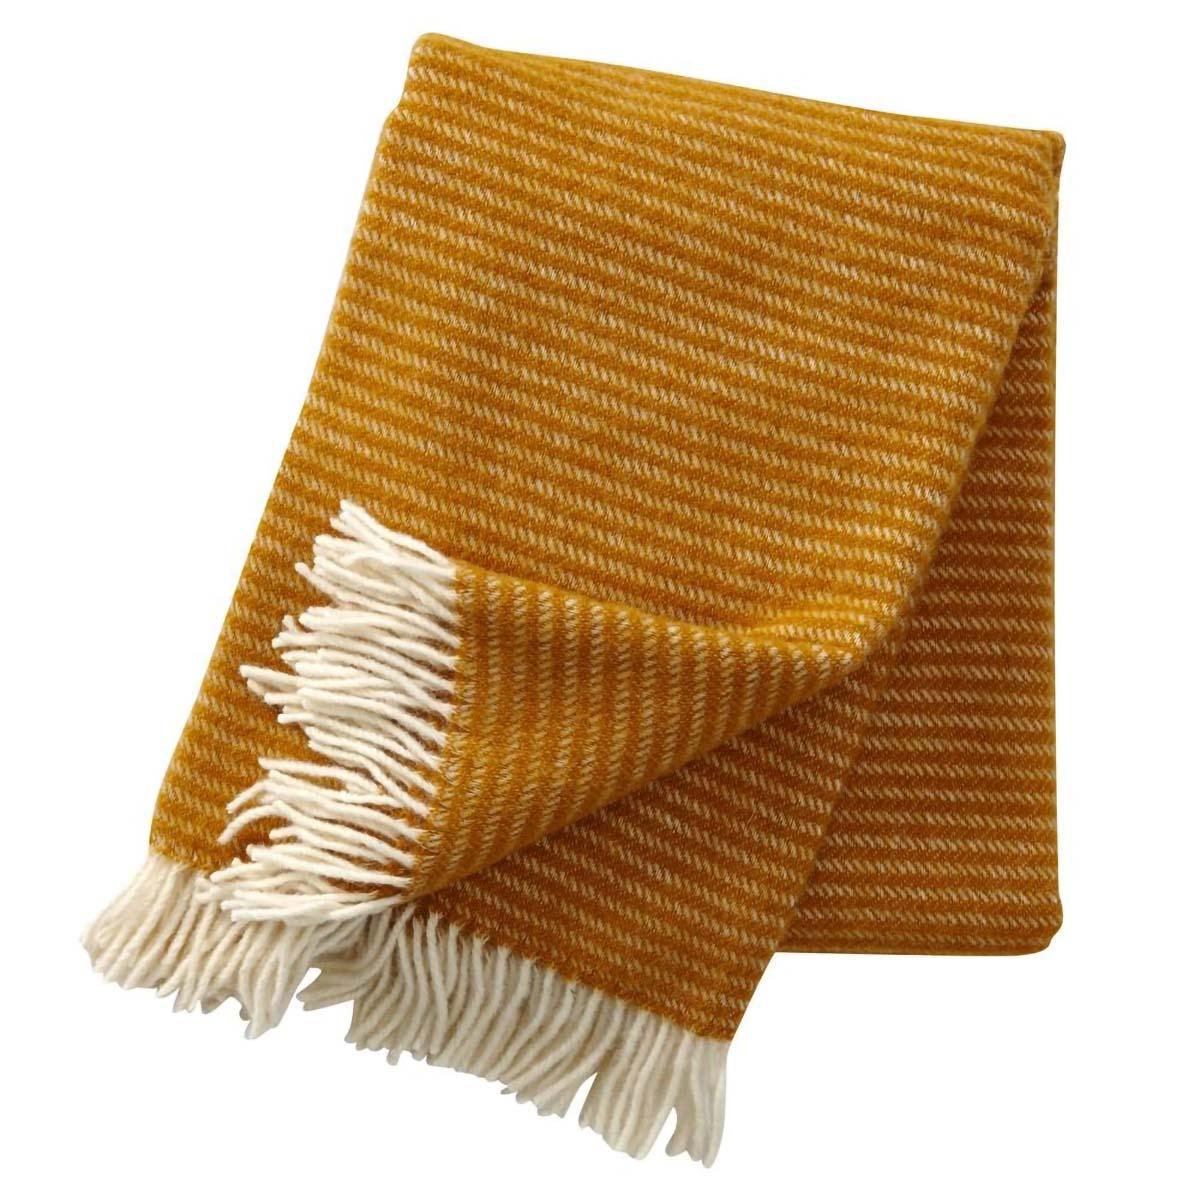 Mustard Ralph Blanket, Klippan